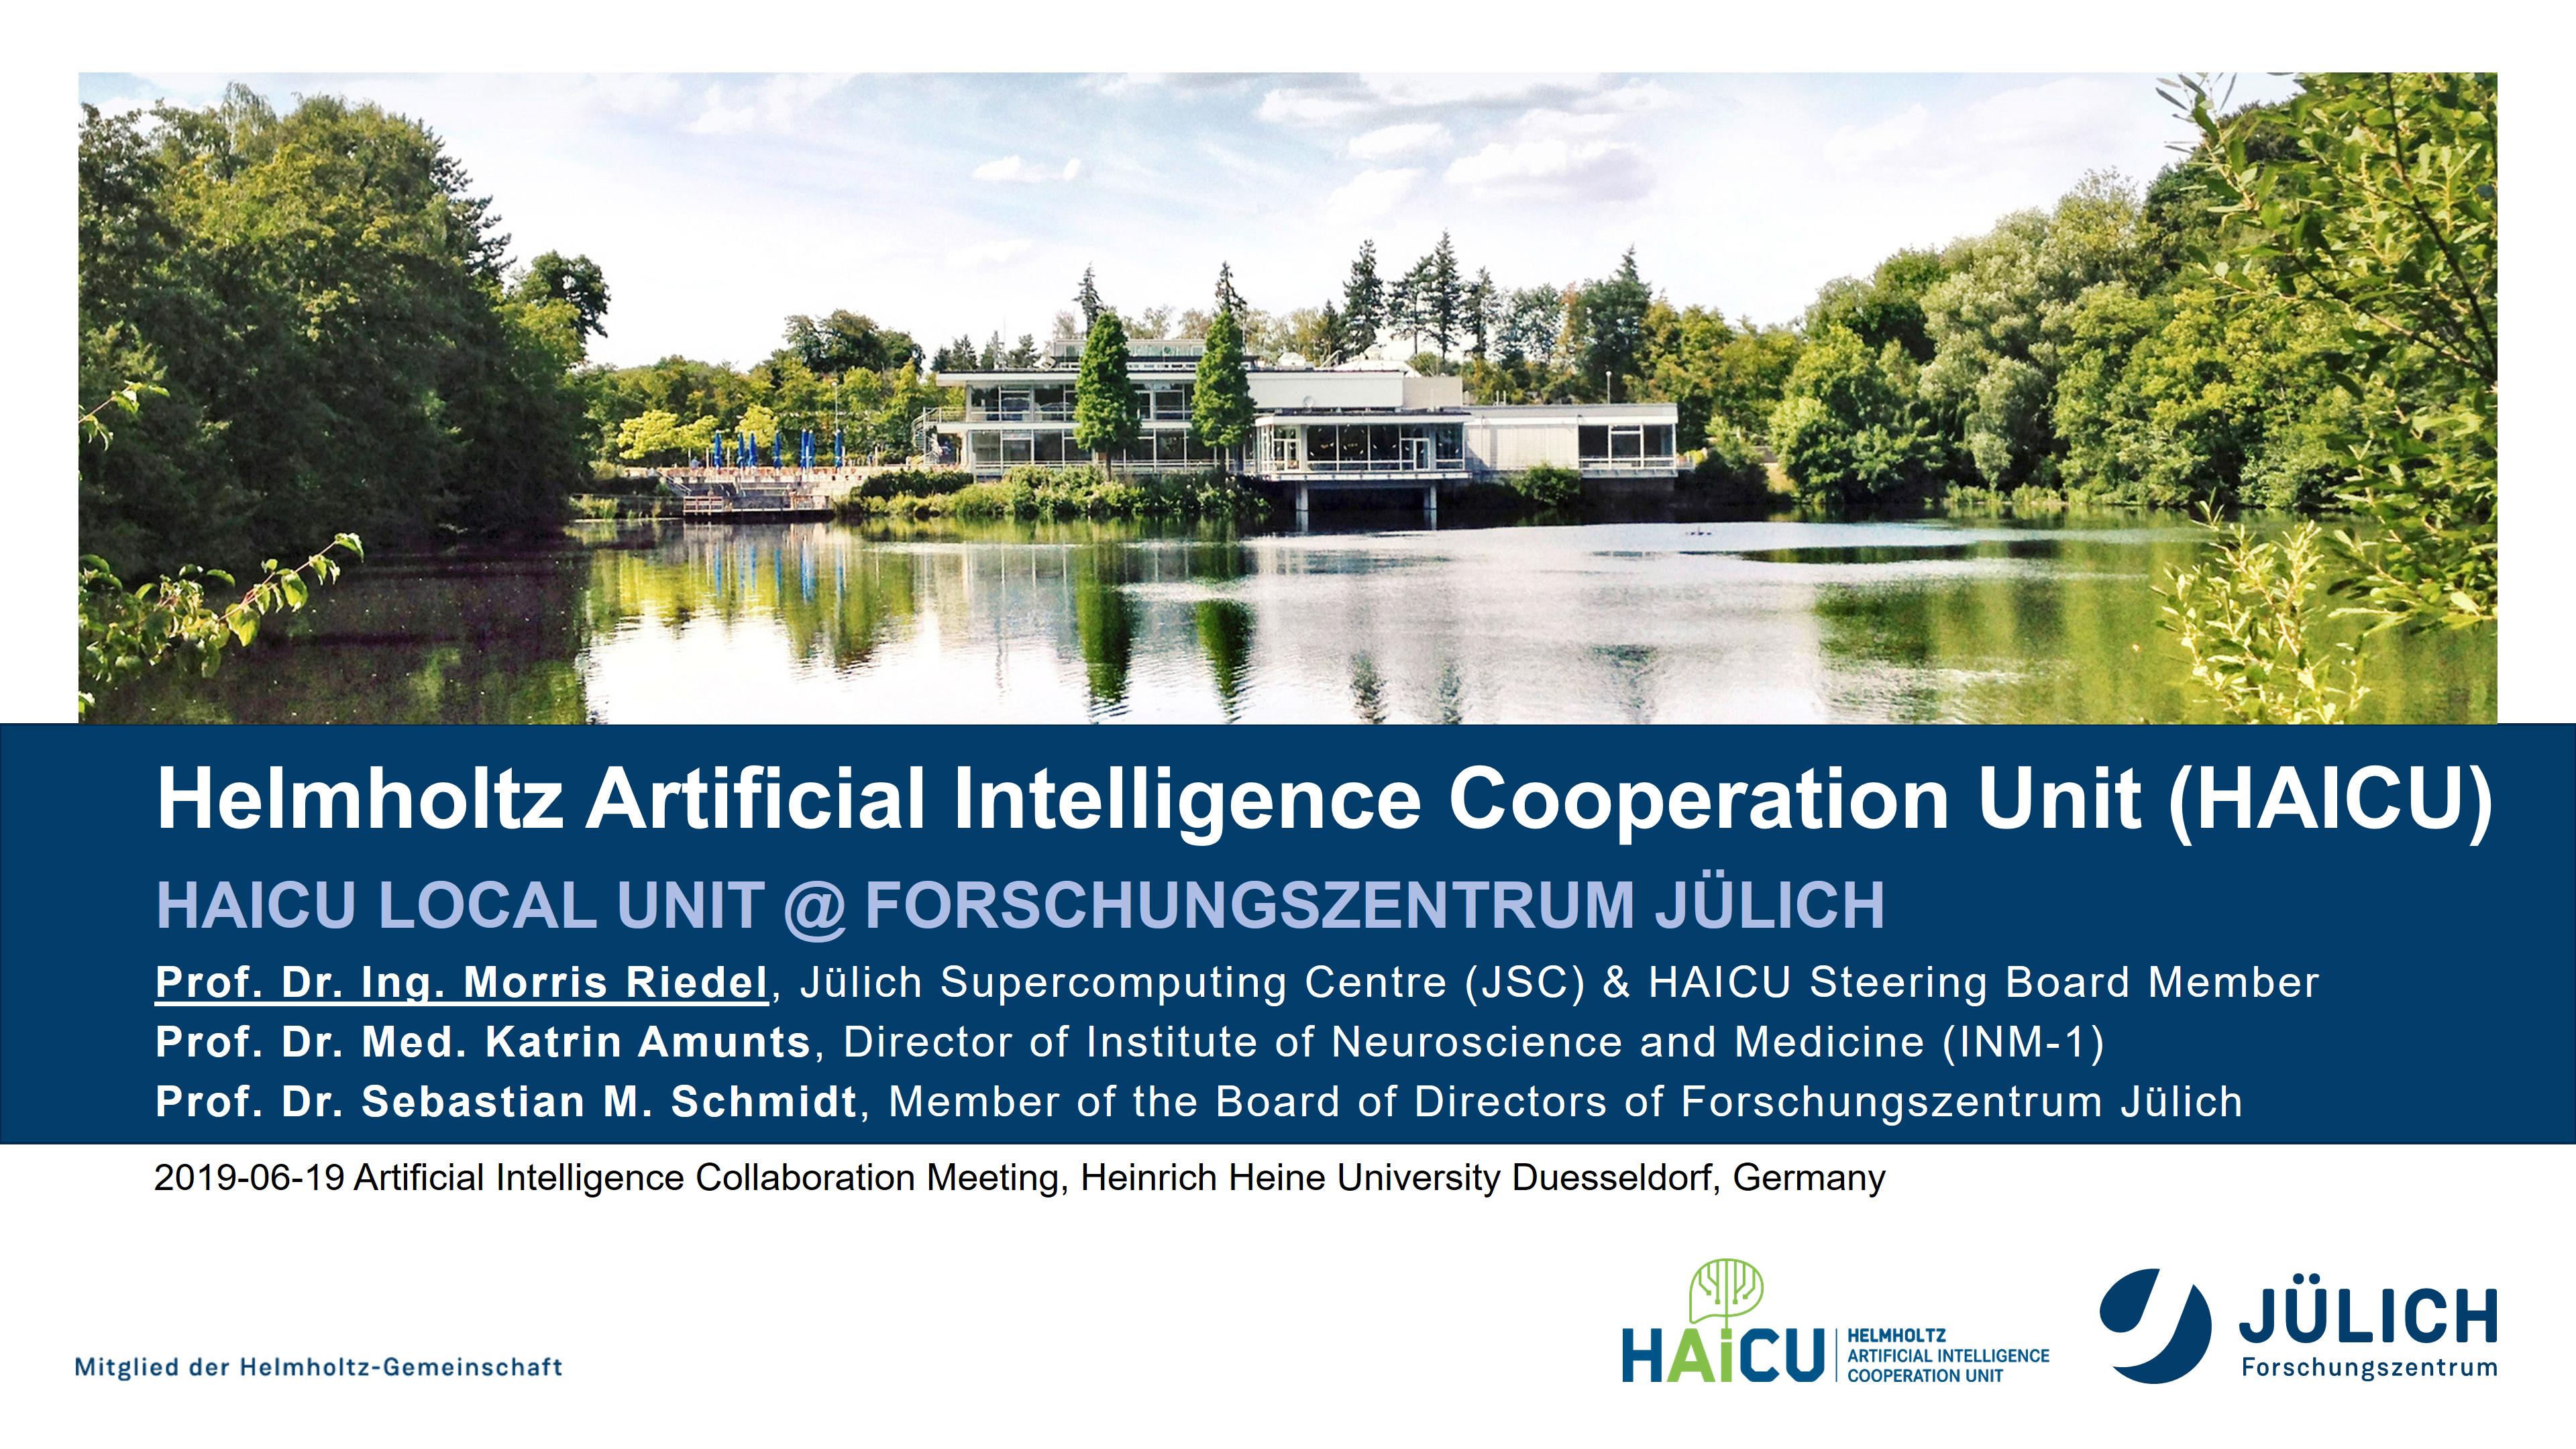 Helmholtz Artificial Intelligence Cooperation Unit - HAICU